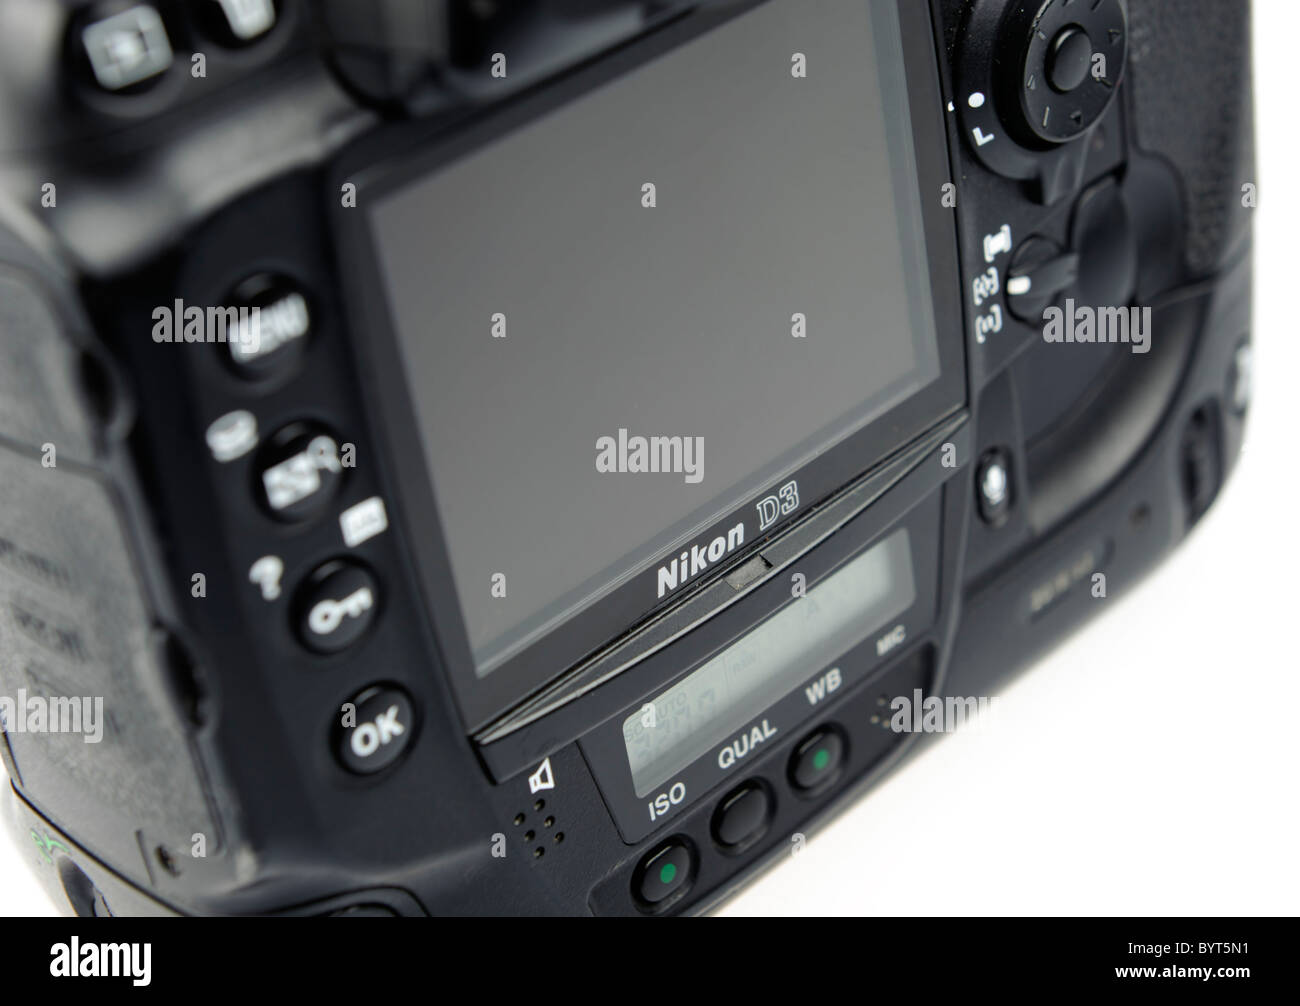 Detail shot of a Nikon D3 digital camera cutout on white background - Stock Image